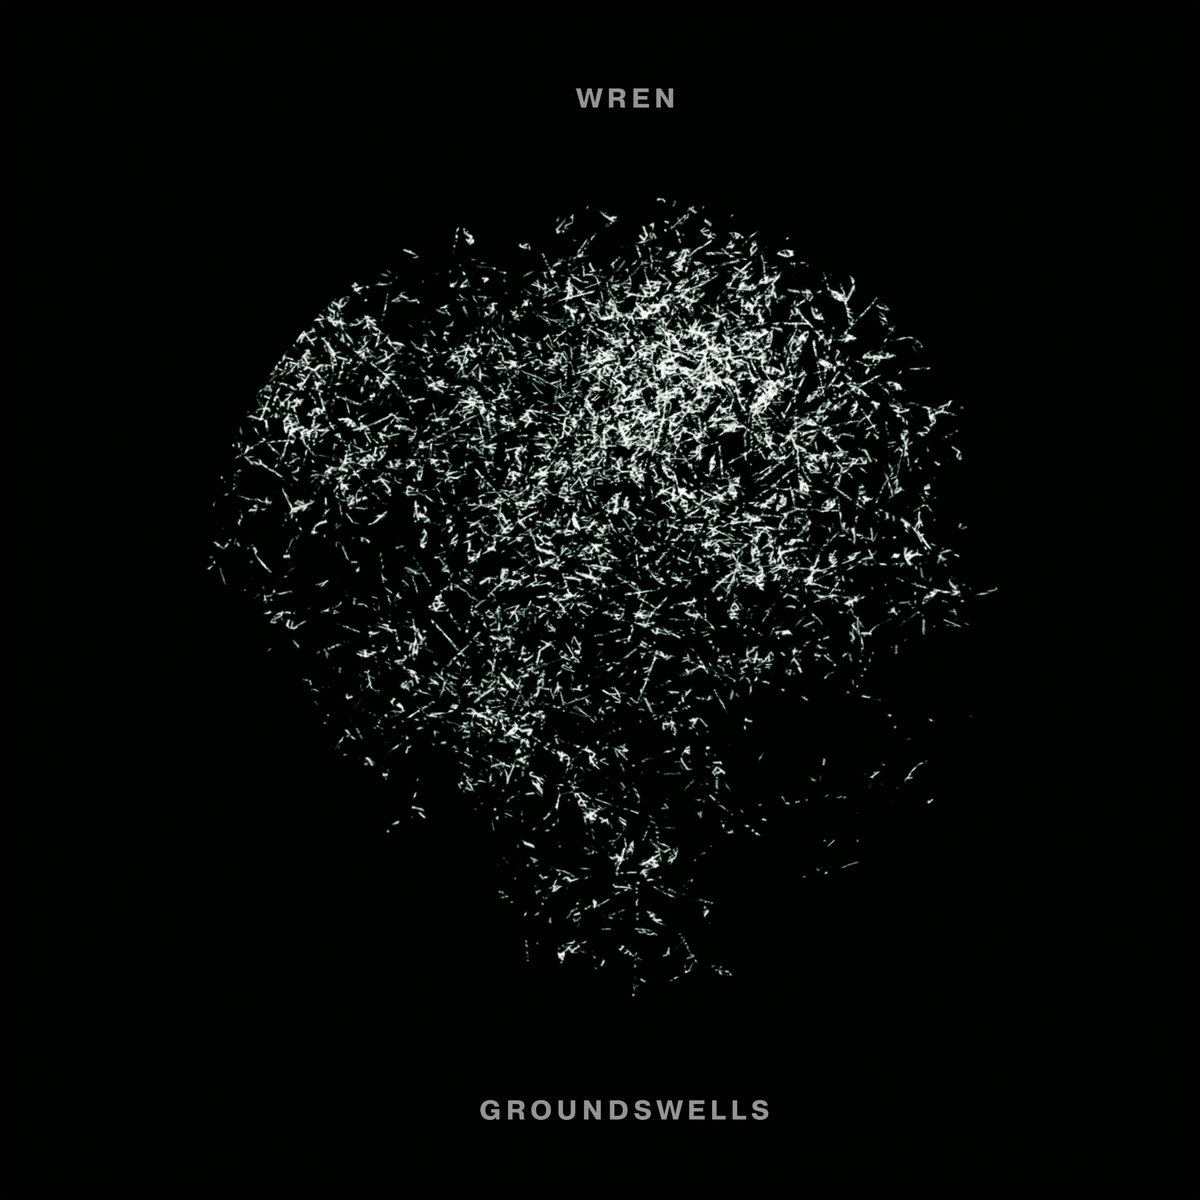 WREN - Groundswells cover